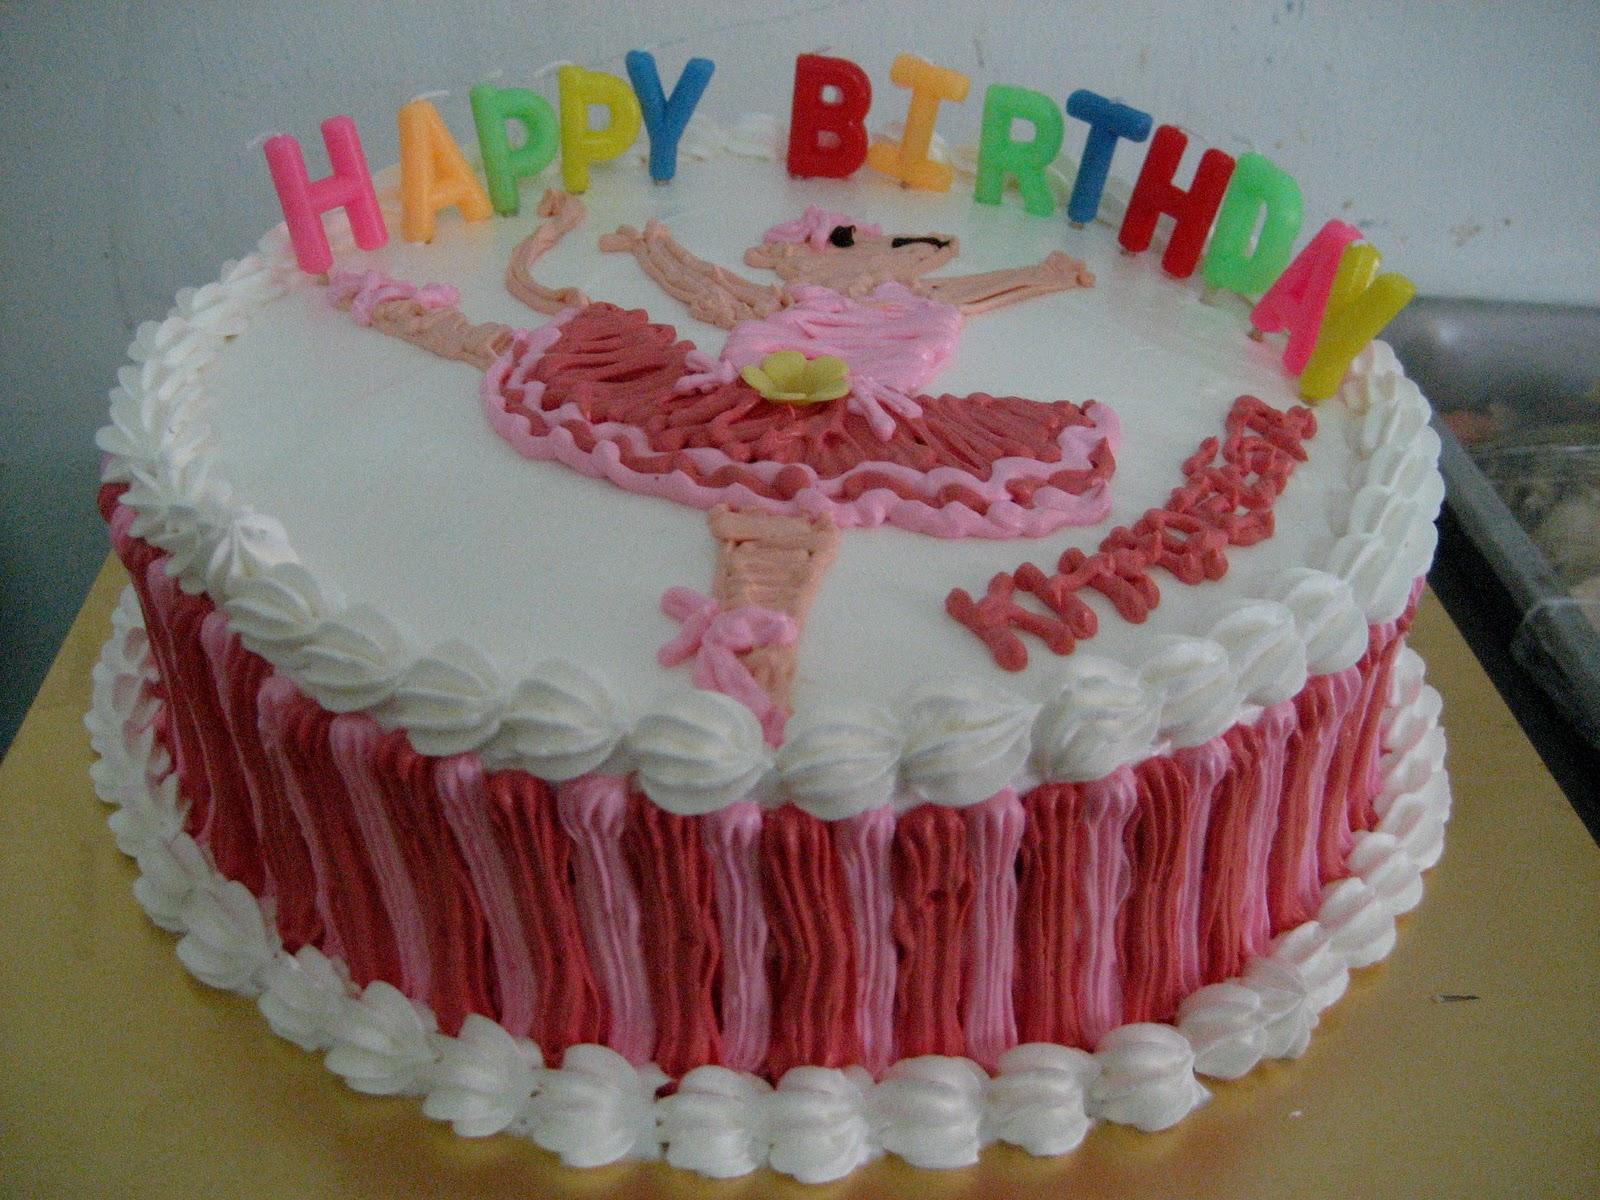 Cake Images With Name Irfan : Shugarholic: Birthday cakes with angelina ballerina theme